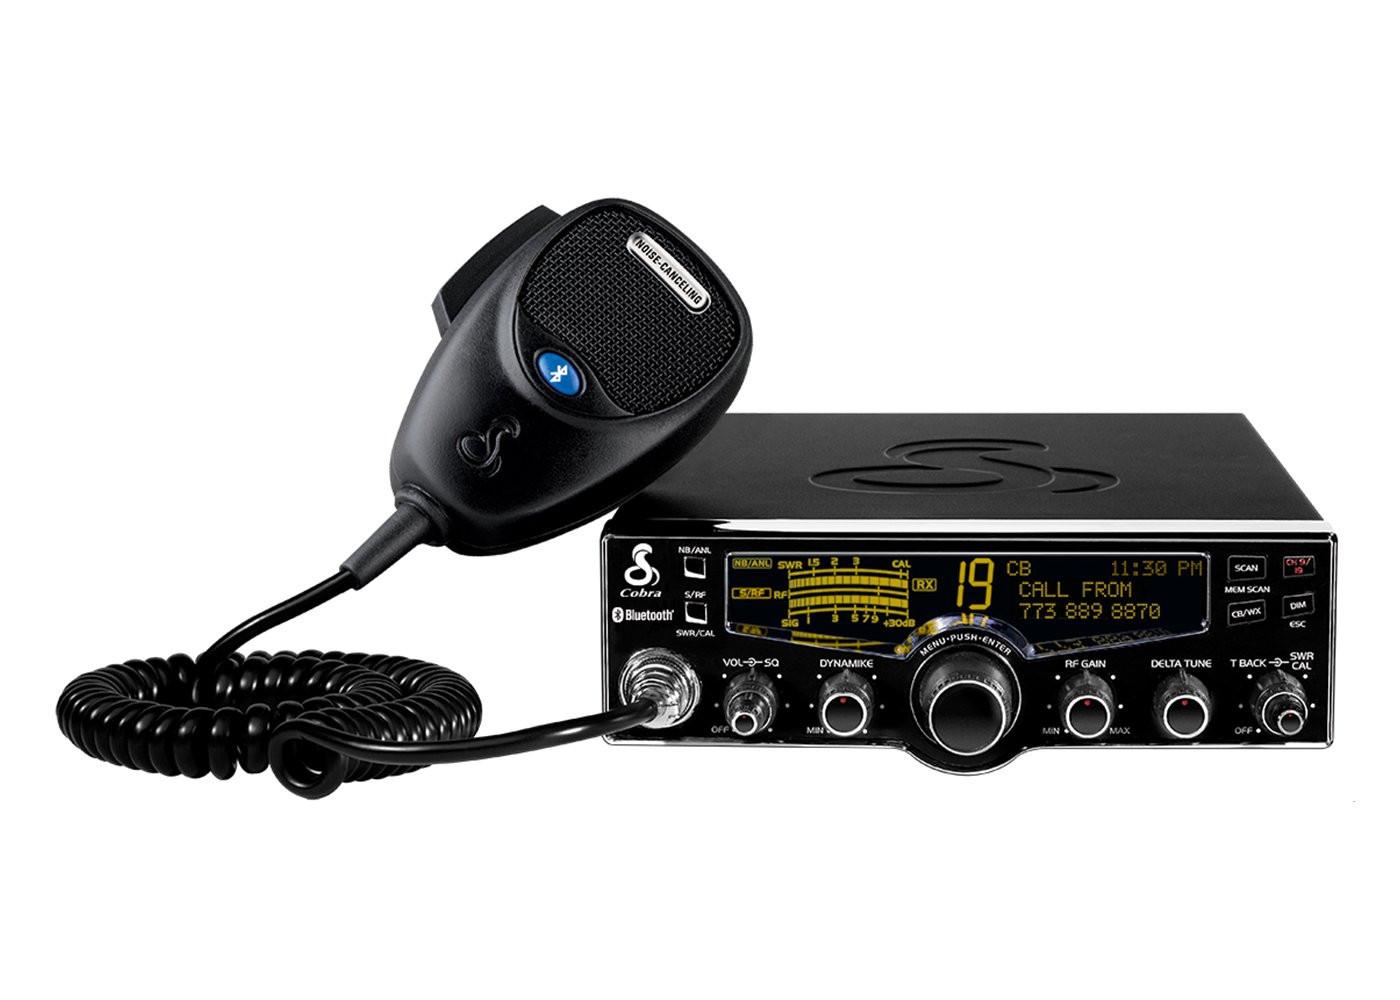 Cobra Electronics 29 LX BT Professional CB Radio With Bluetooth, Weather & Nightwatch 29LXBT